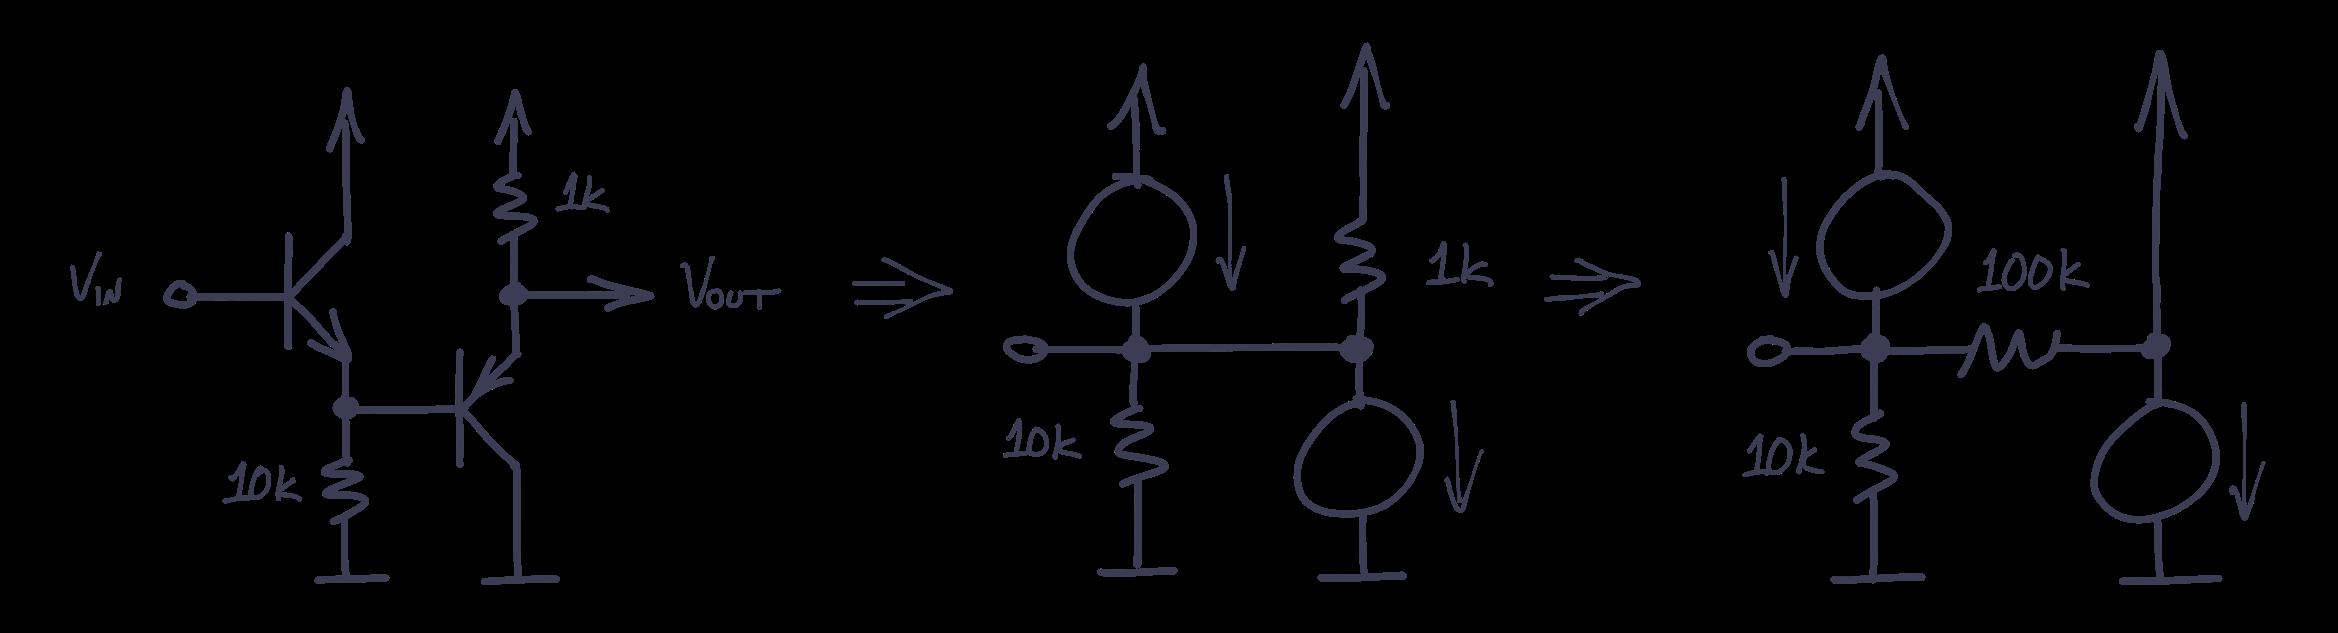 components_bjt-cfp-02.png